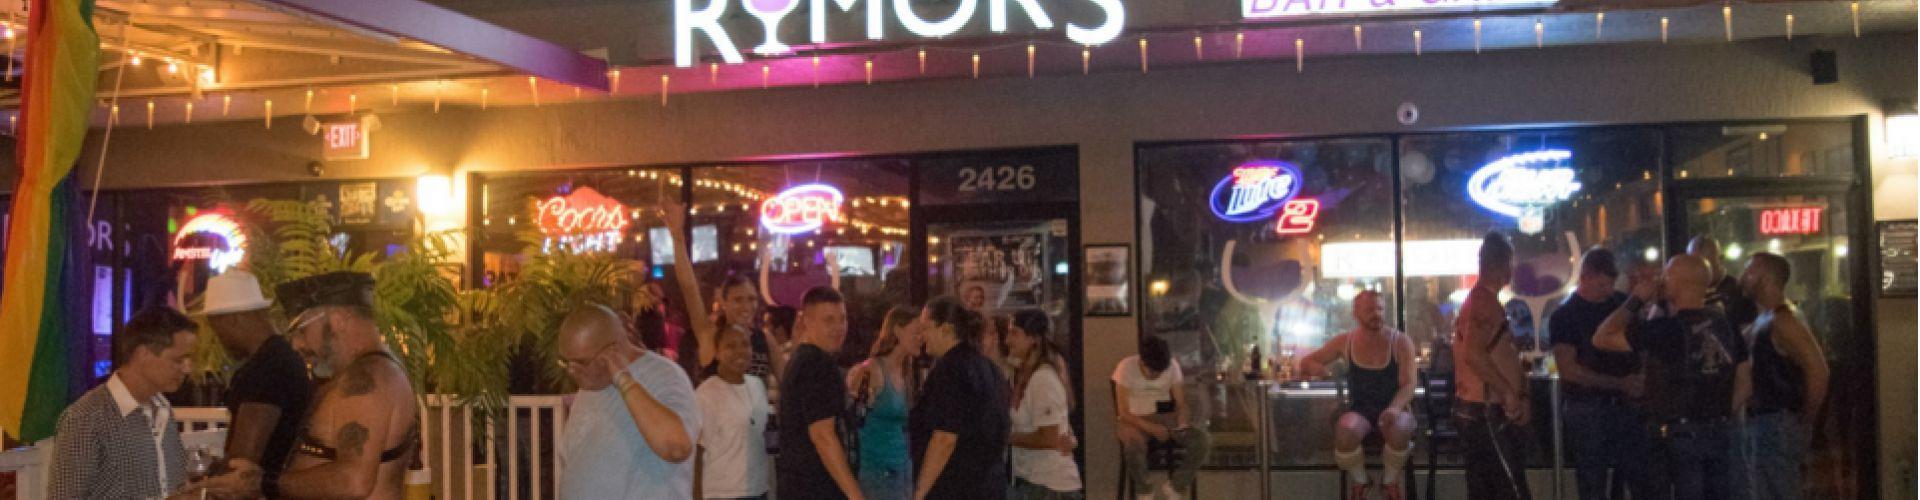 Rumors Bar And Grill >> Rumors Bar Grill Lgbtq Fort Lauderdale Reviews